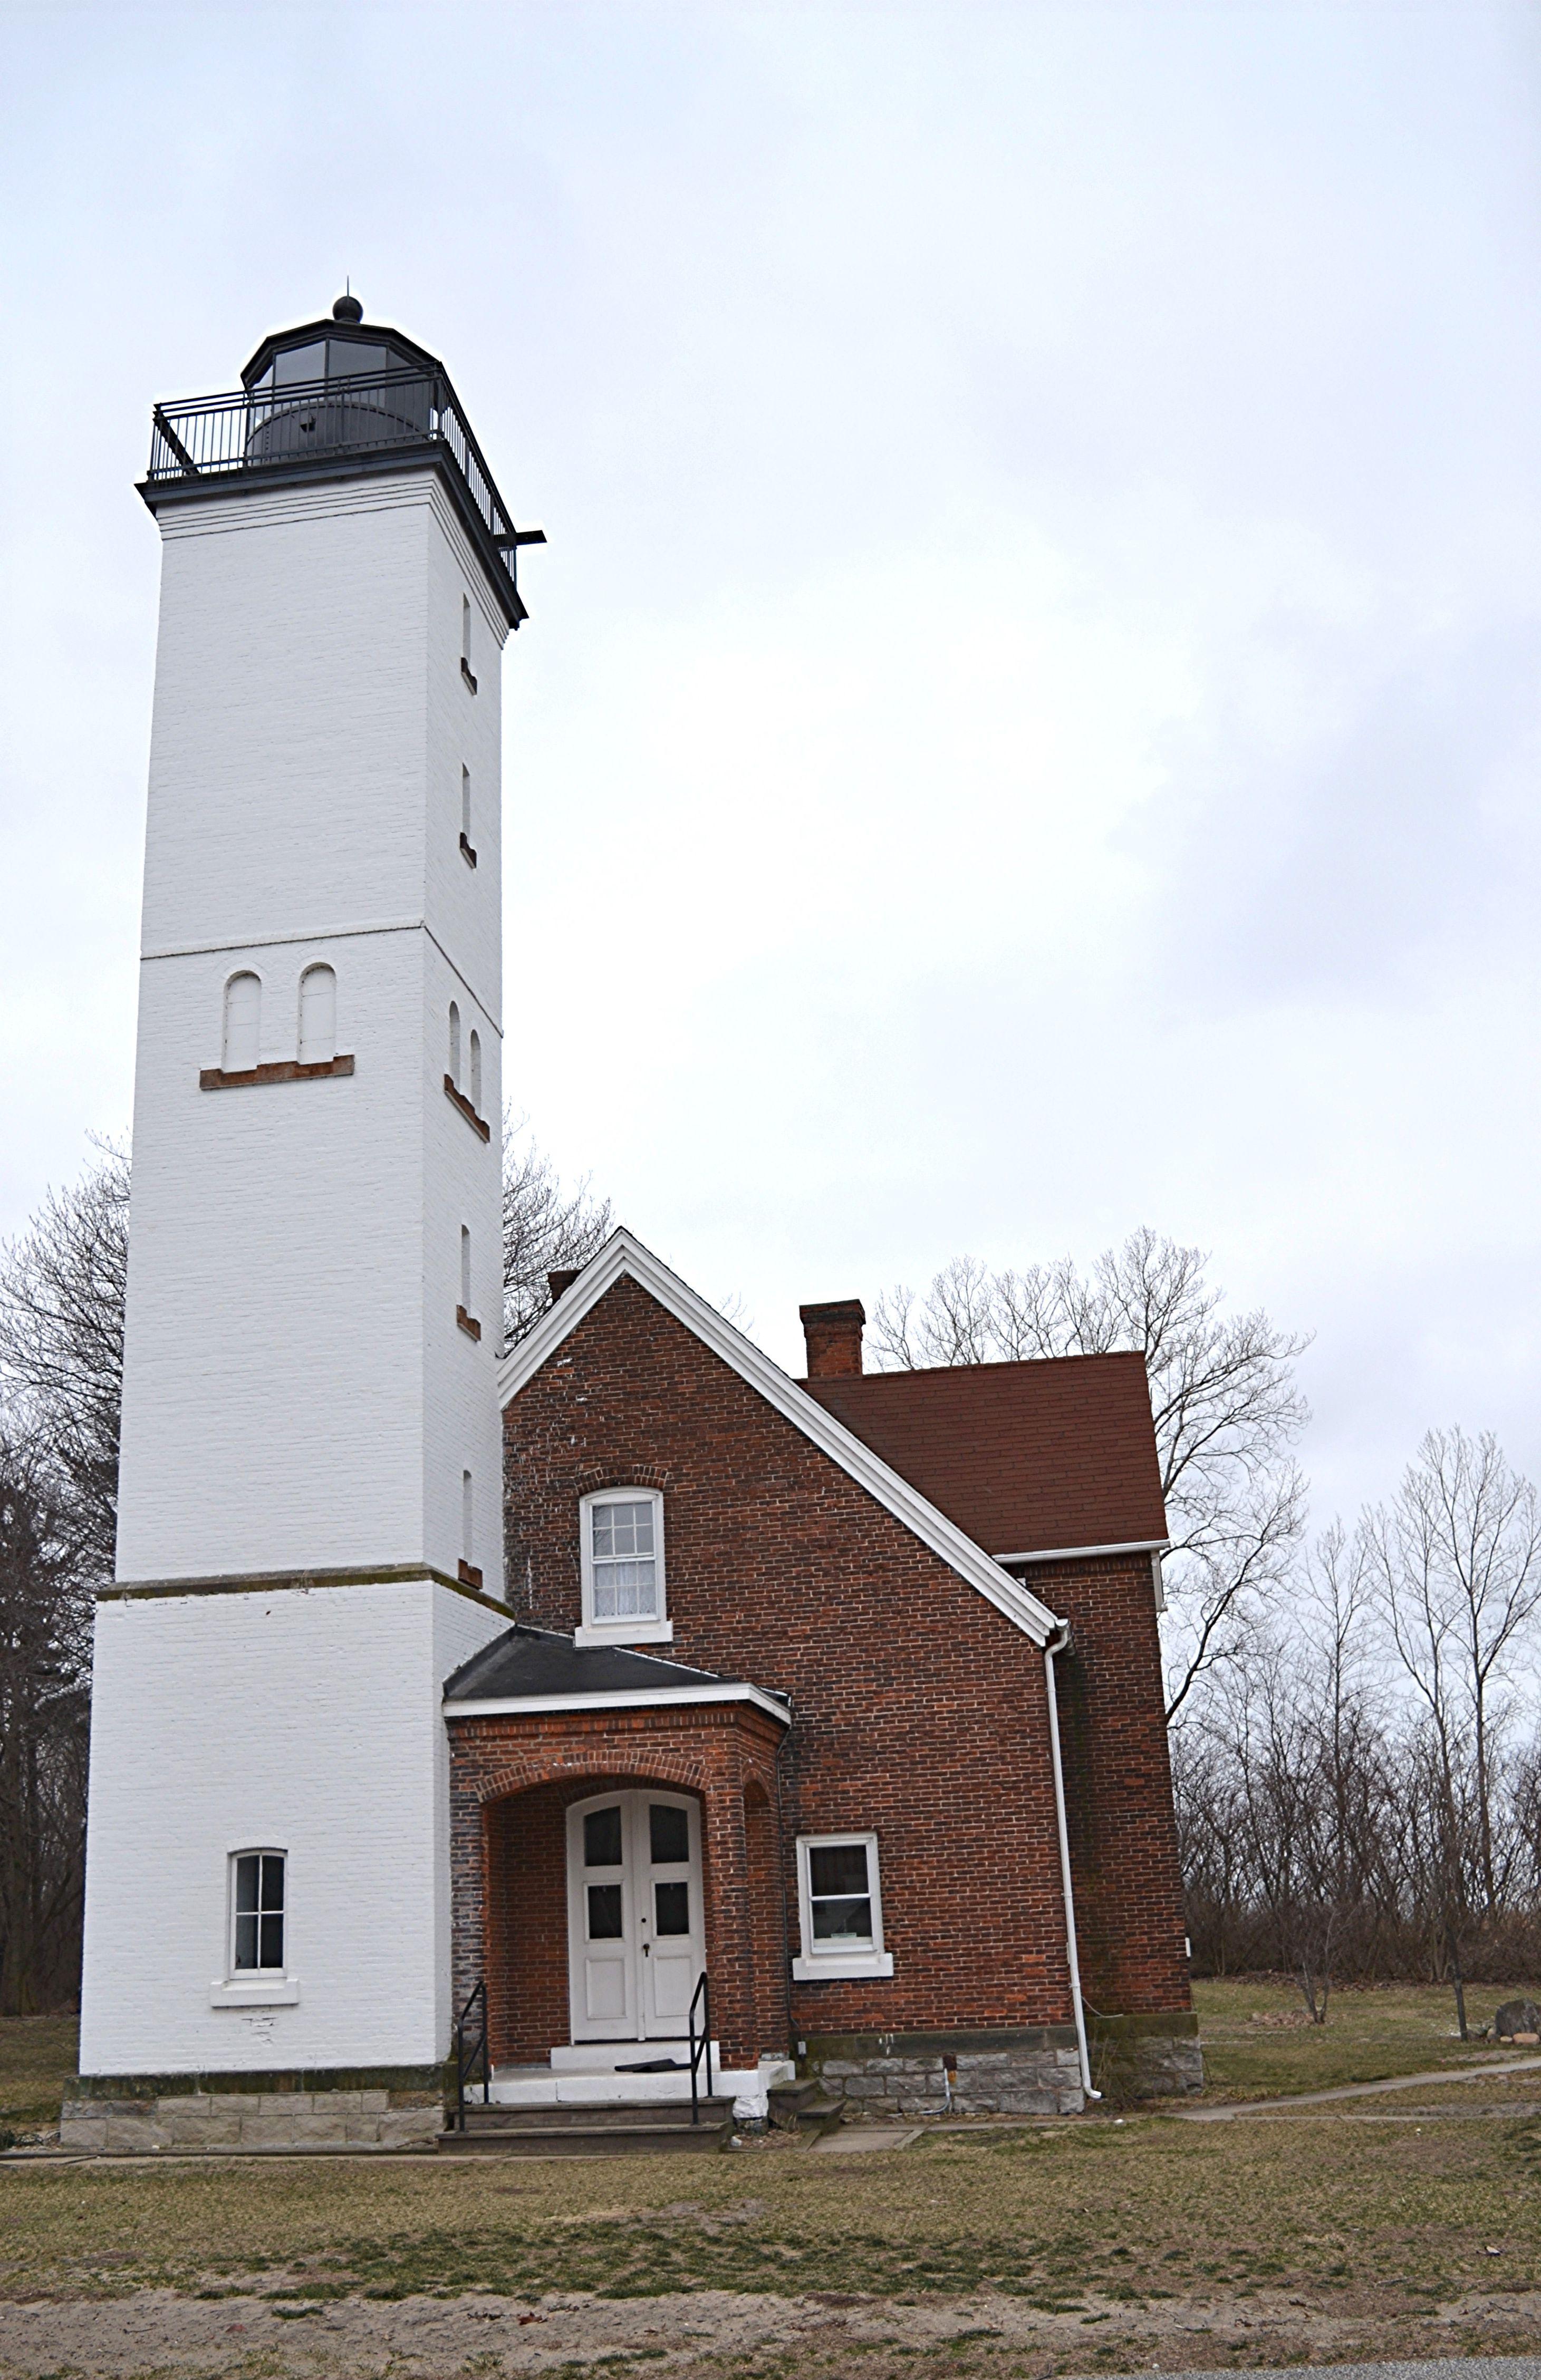 Presque isle Lighthouse Erie Pa Presque isle